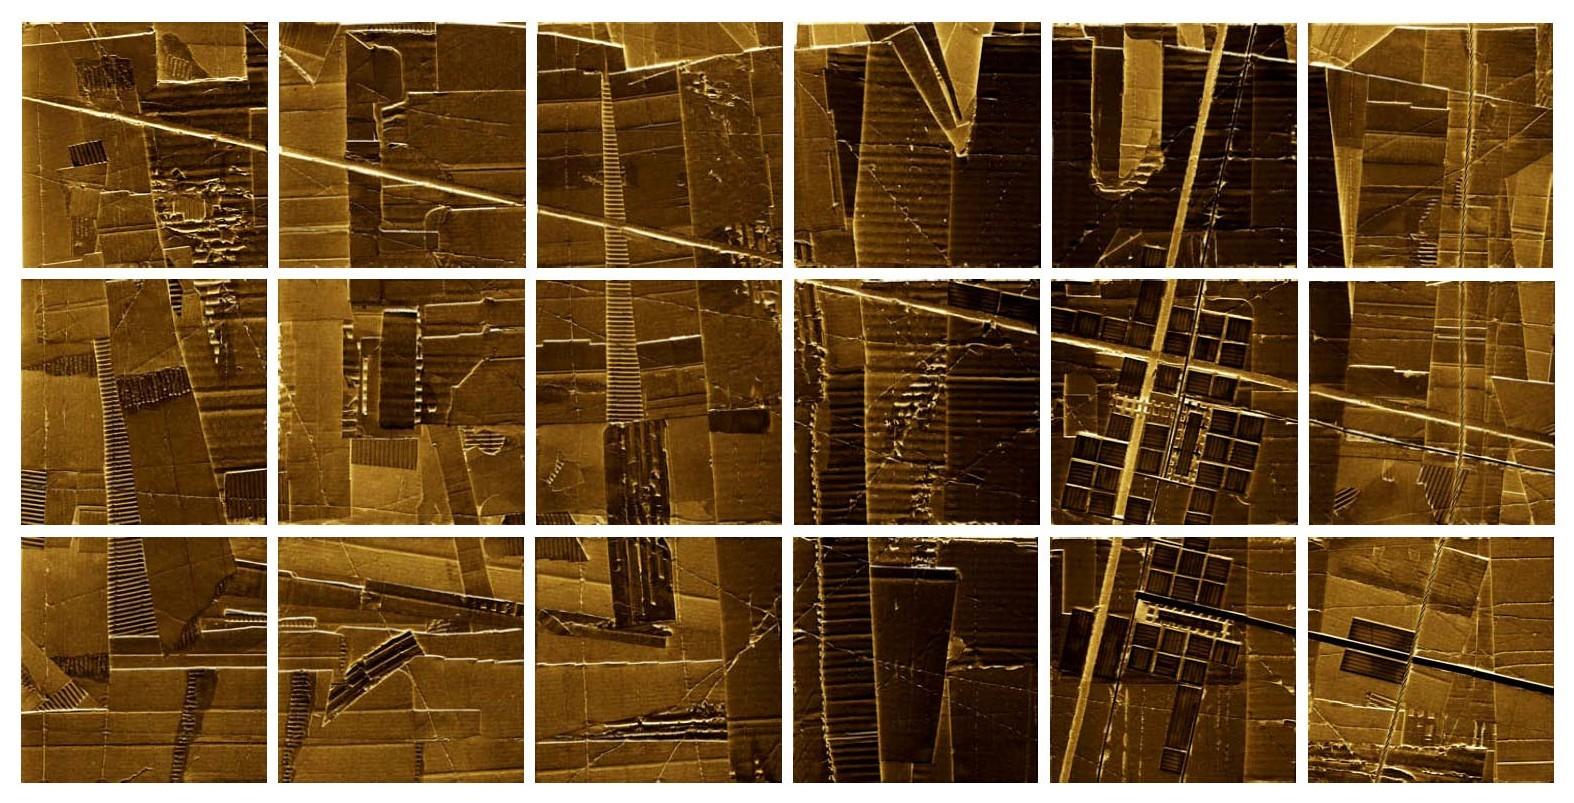 """urbanaurea: sito A - au"" / AD012-02a / formati: originale [o] cm 150 x 75 - riproduzione ridotta [r] cm 92 x 43"